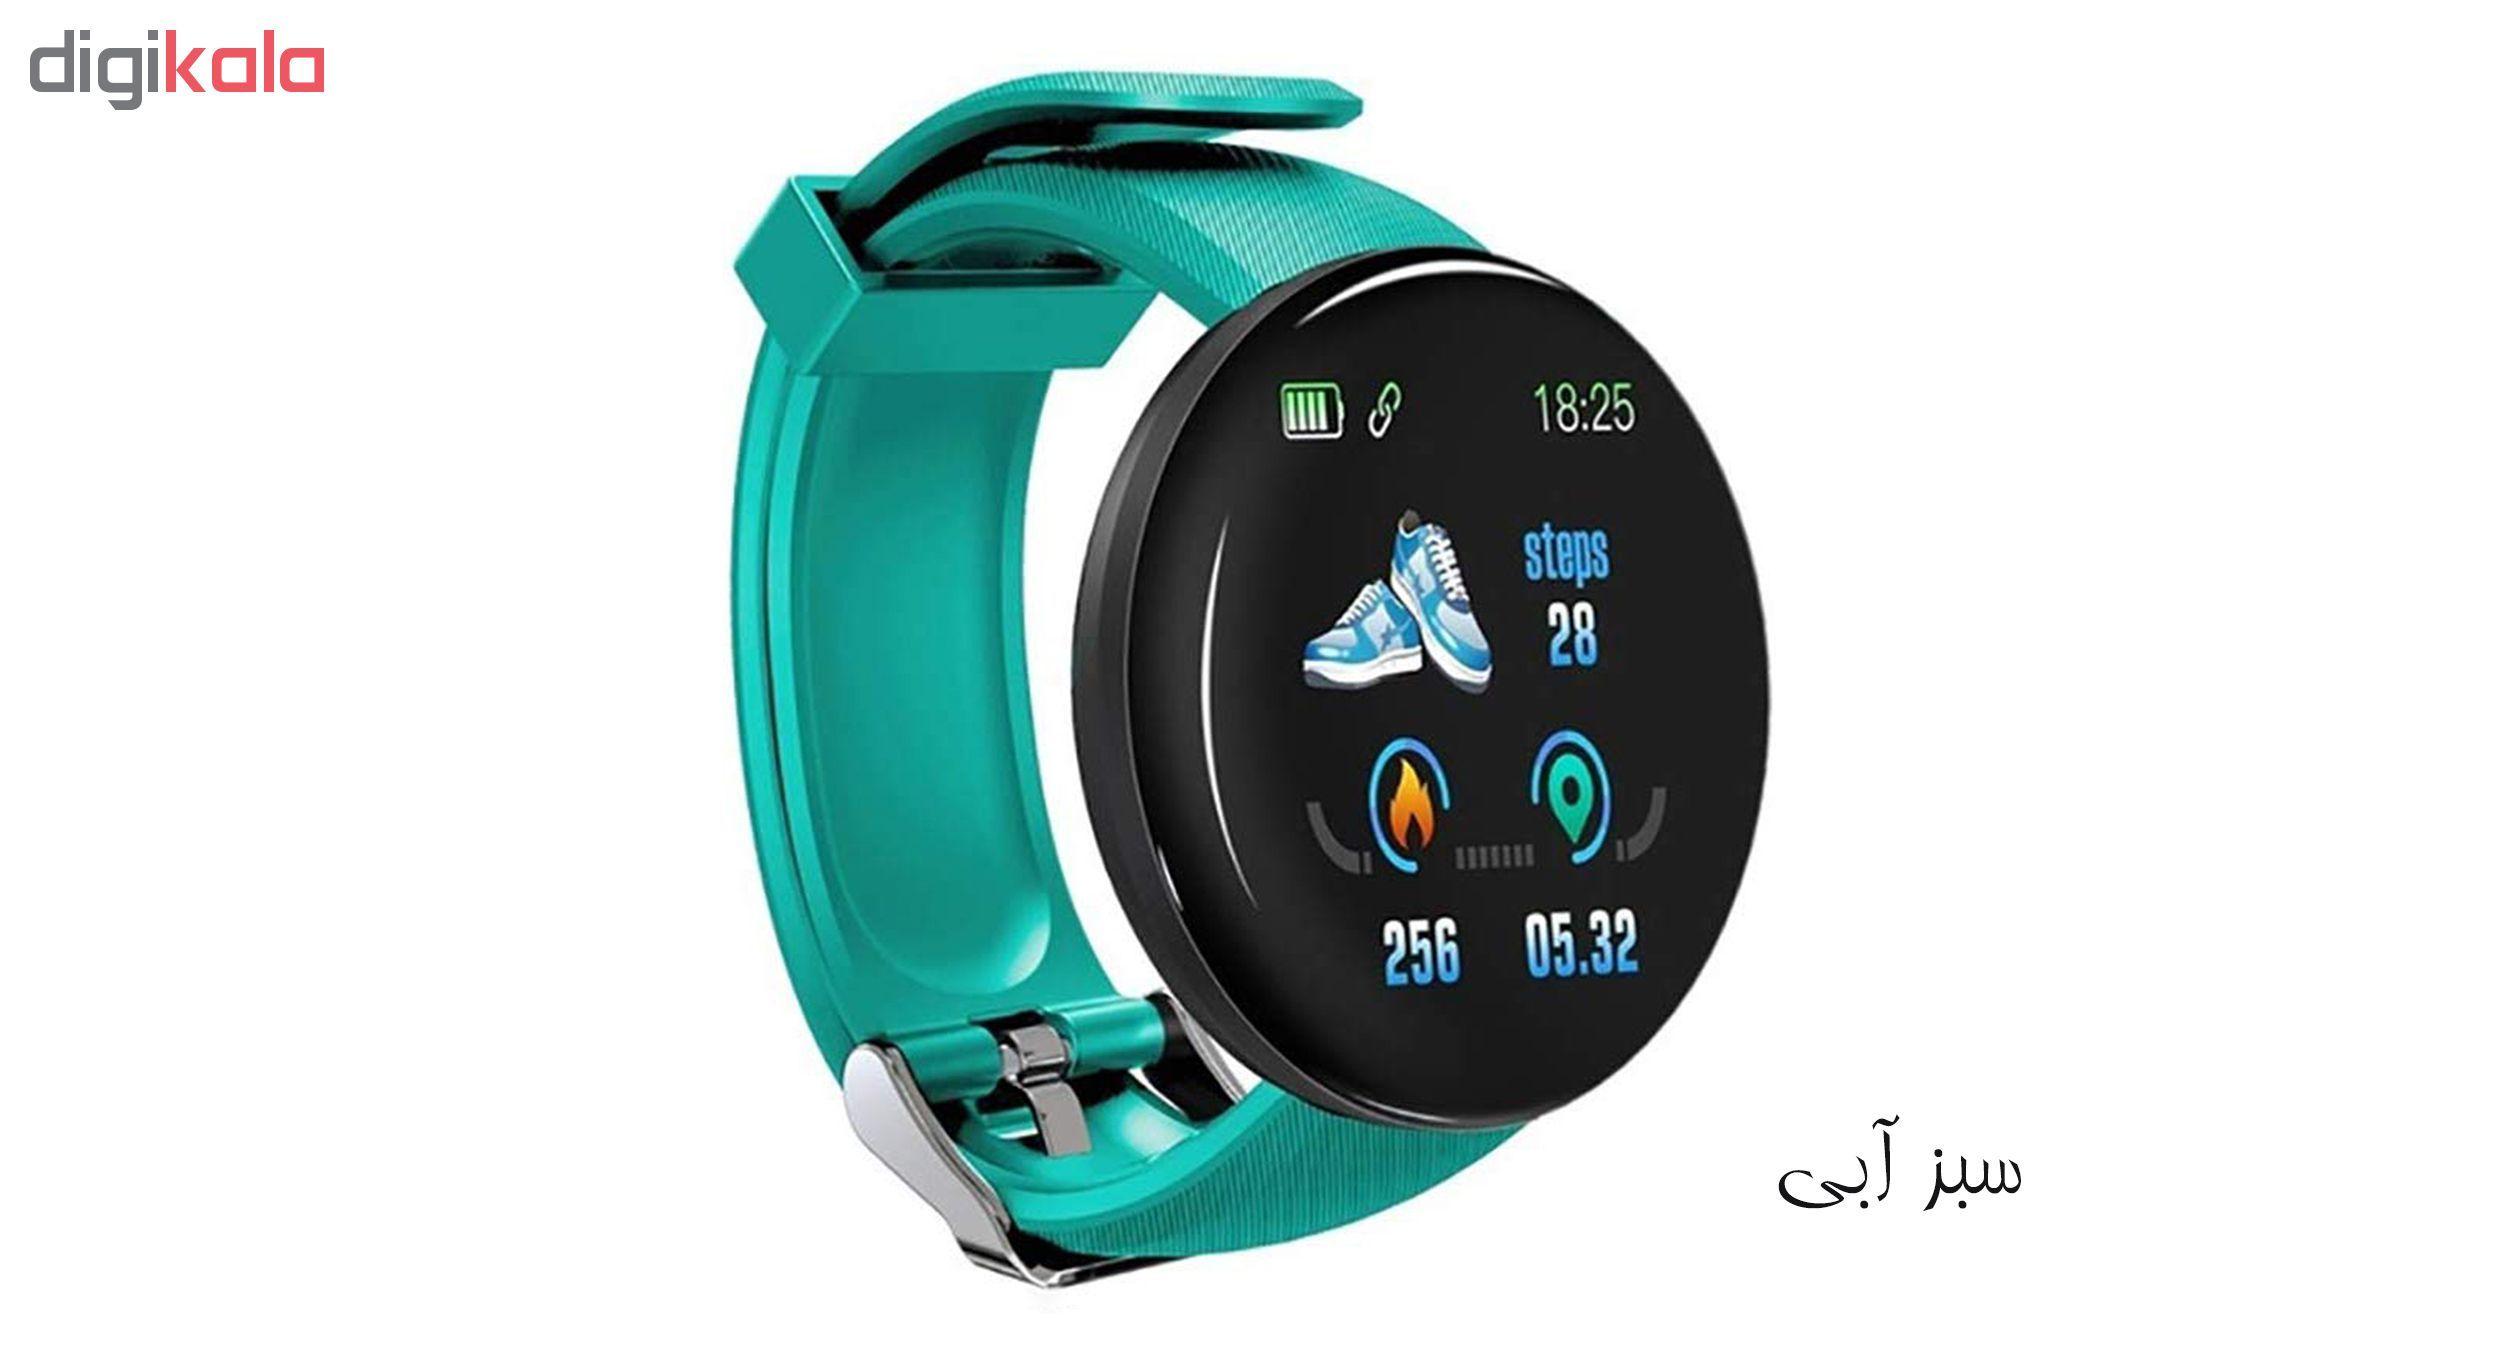 ساعت هوشمند مدل Bakeey D18 main 1 12